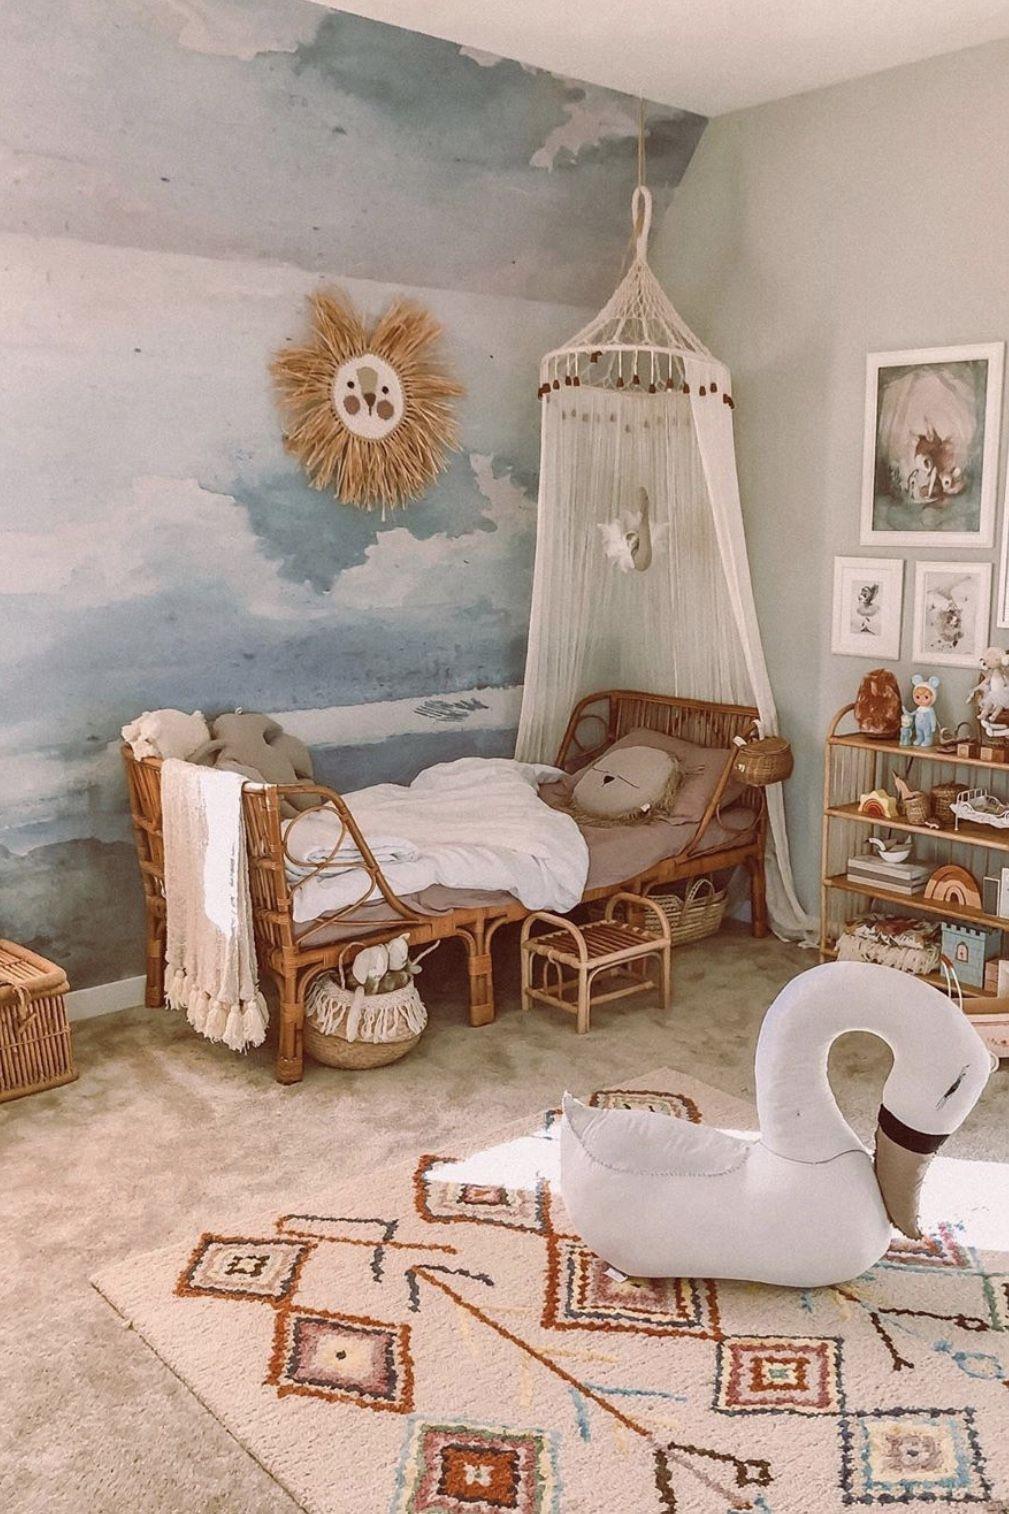 Cloud Wallpaper Boho Kids Room Neutral Kids Room Baby Room Decor Decorating kids bedrooms room